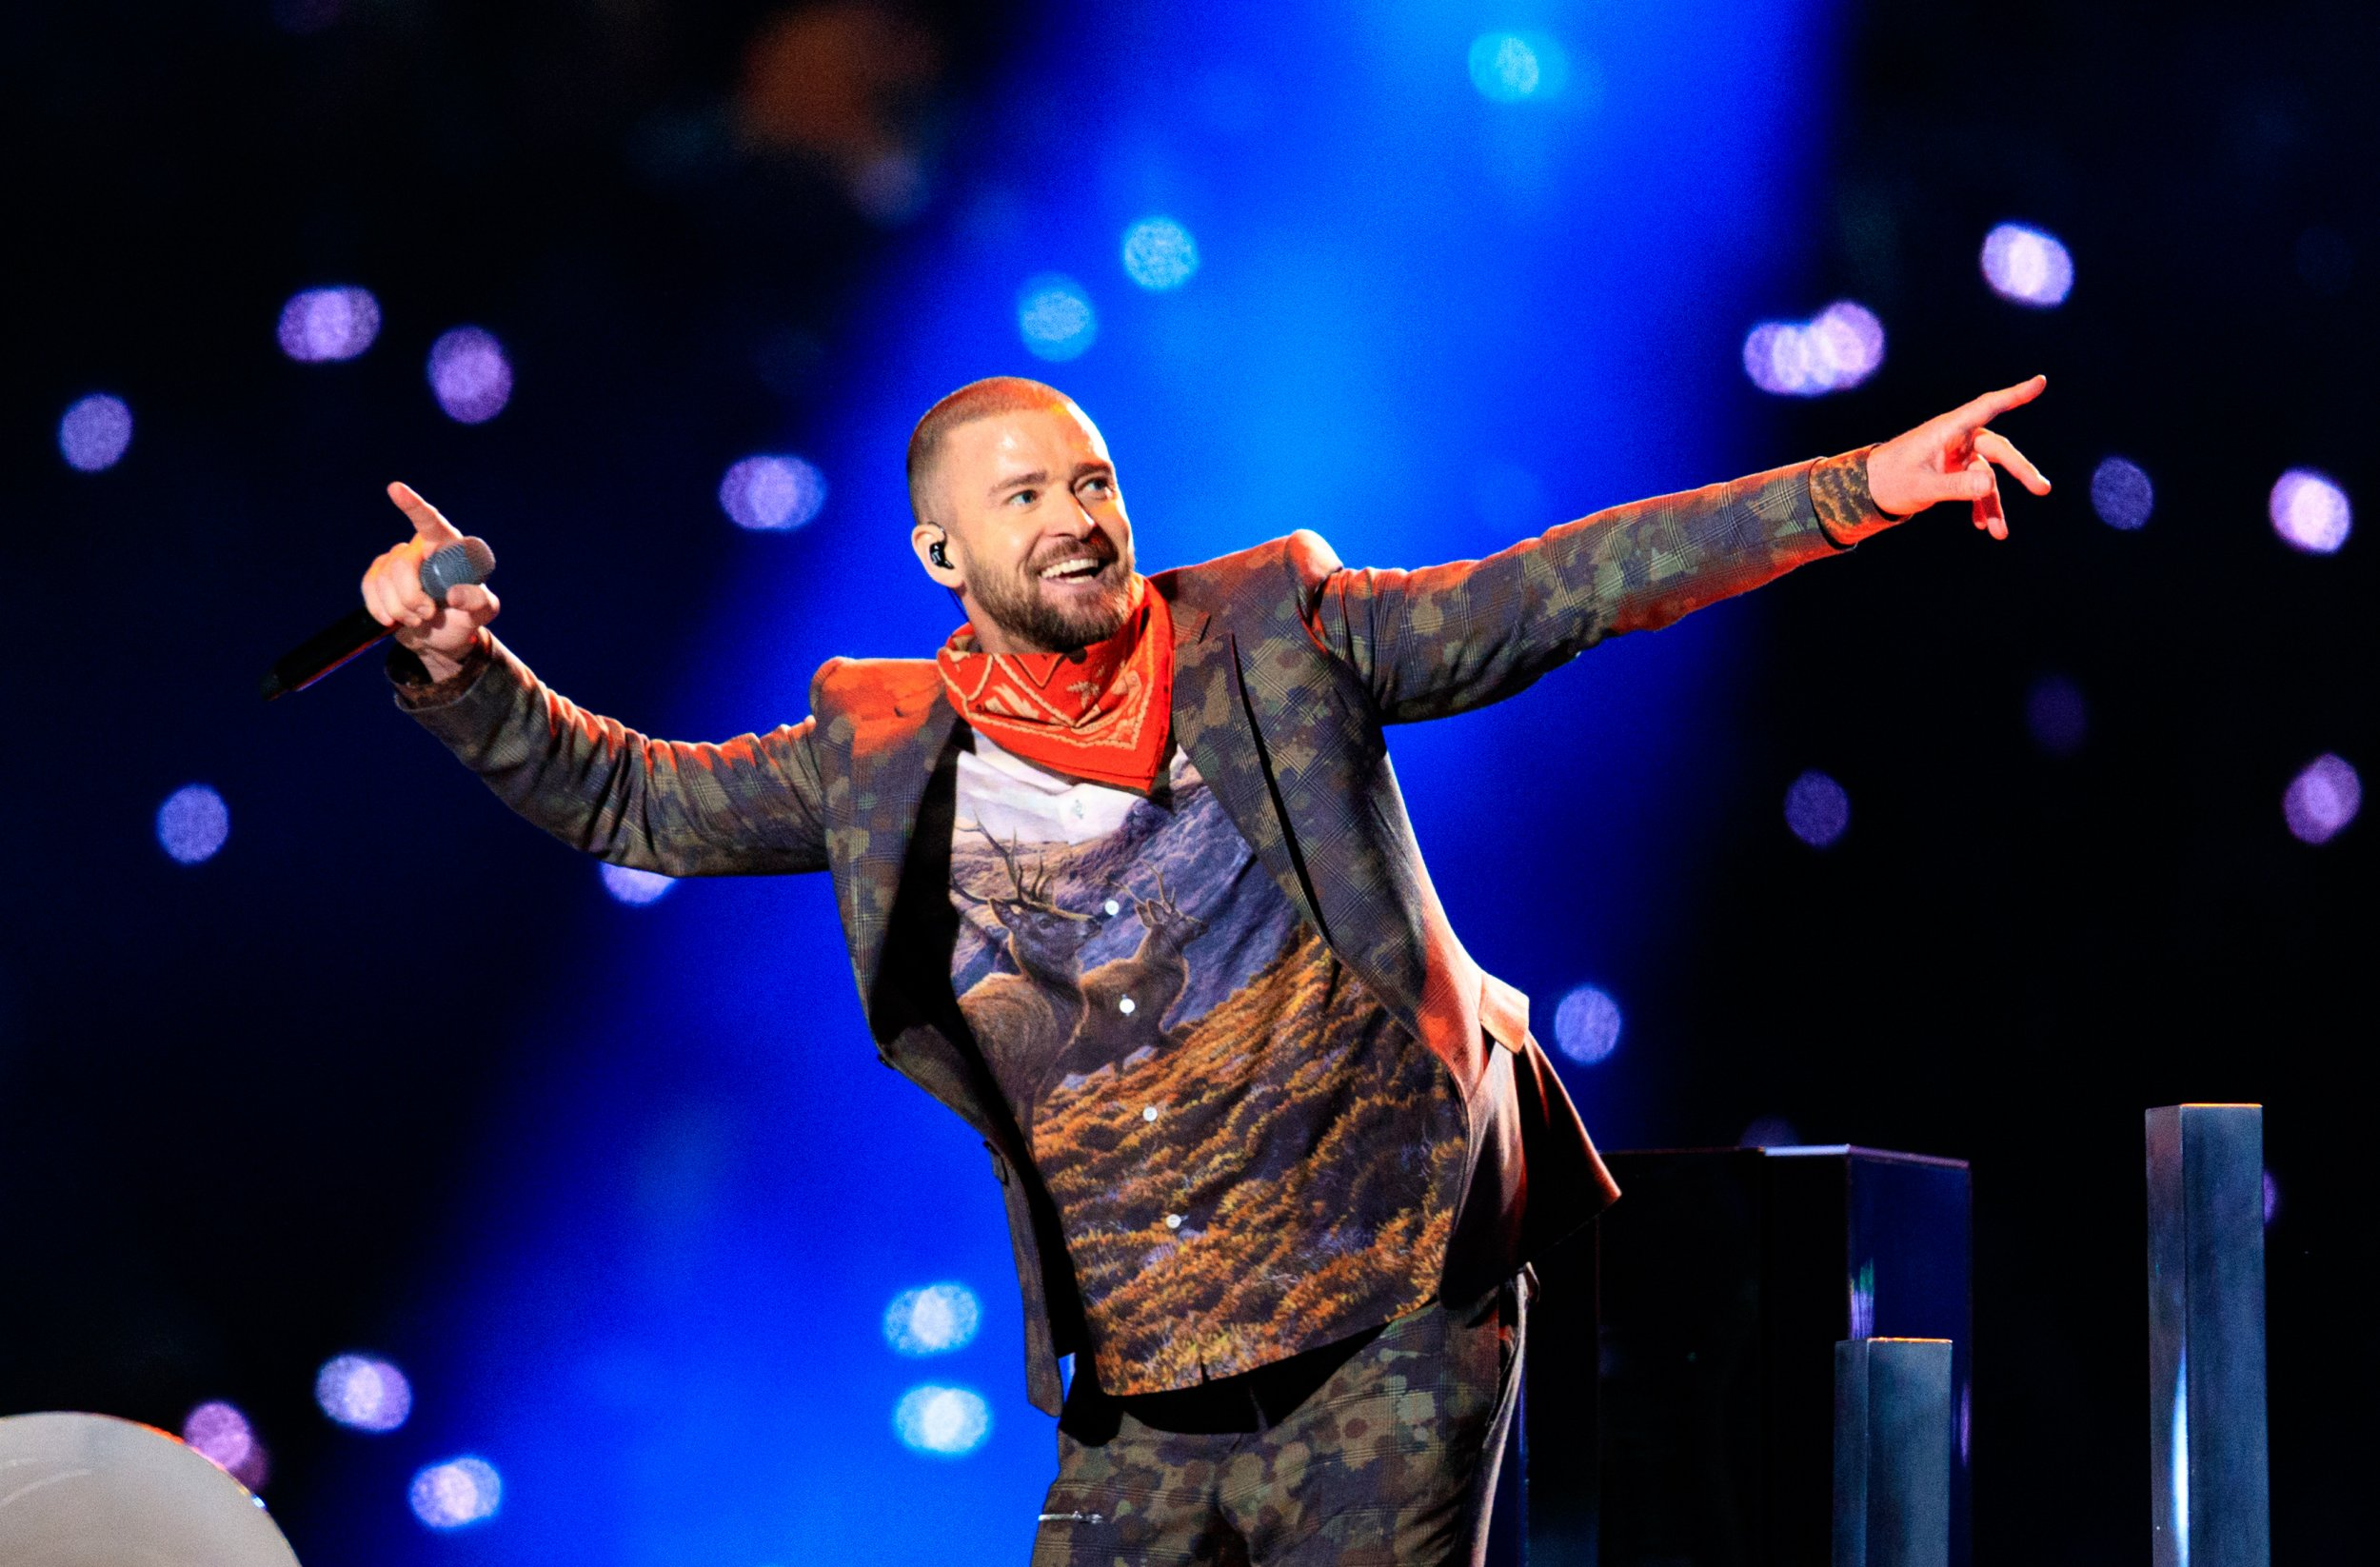 Justin Timberlake performs at Super Bowl LII